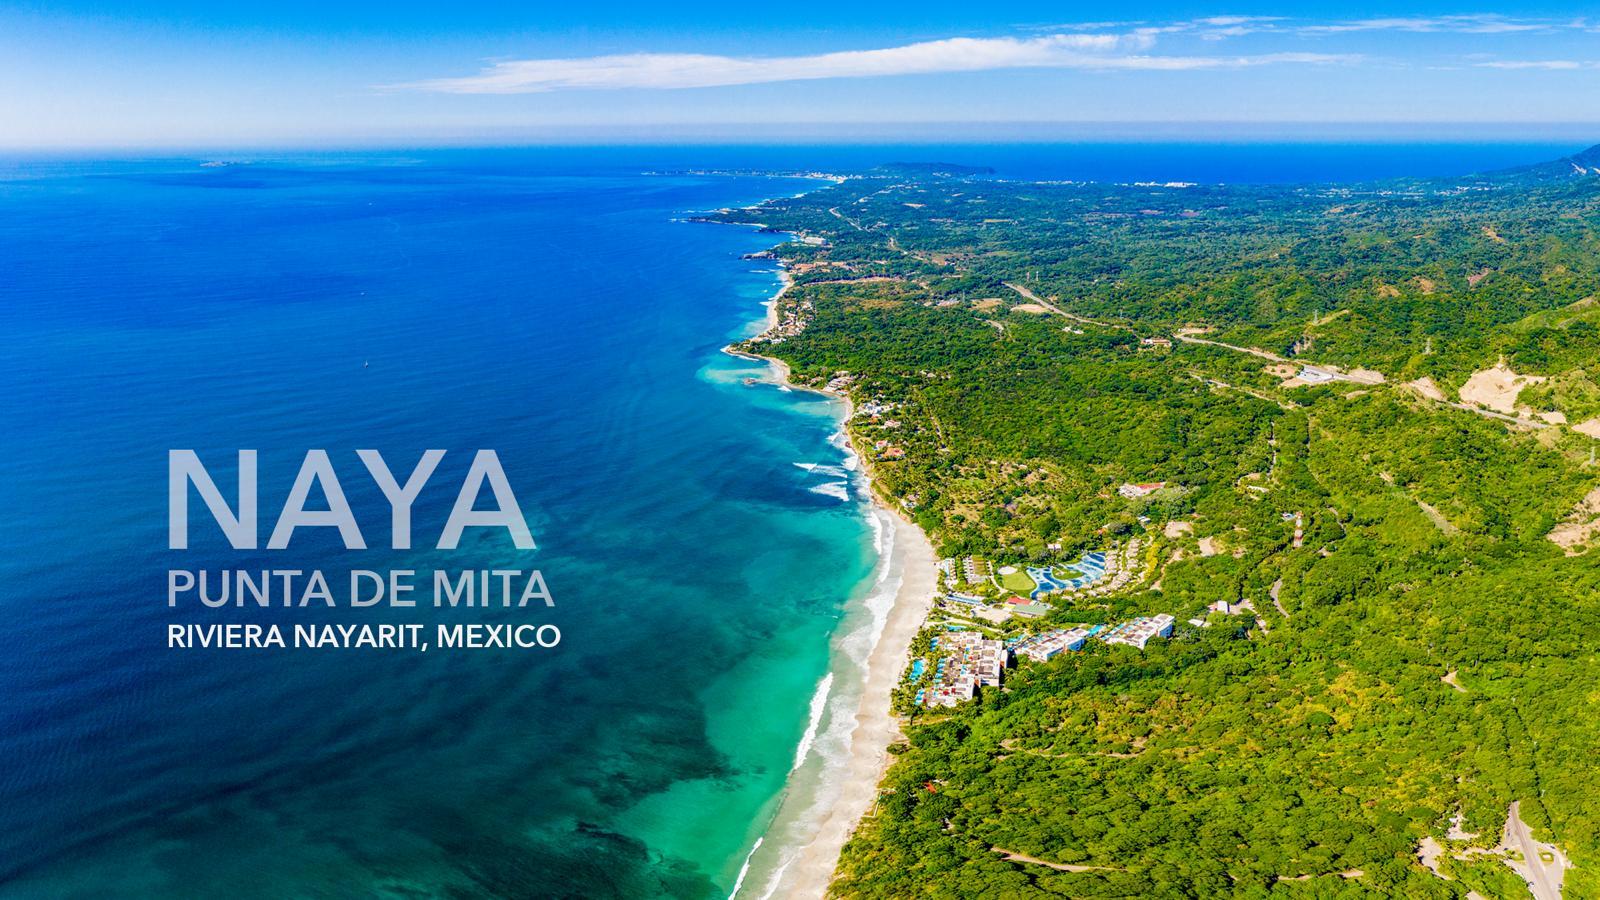 Naya - Punta de Mita luxury beachfront condominiums for sale on the North shore of Puerto Vallarta, Mexico - LPR Luxury real estate